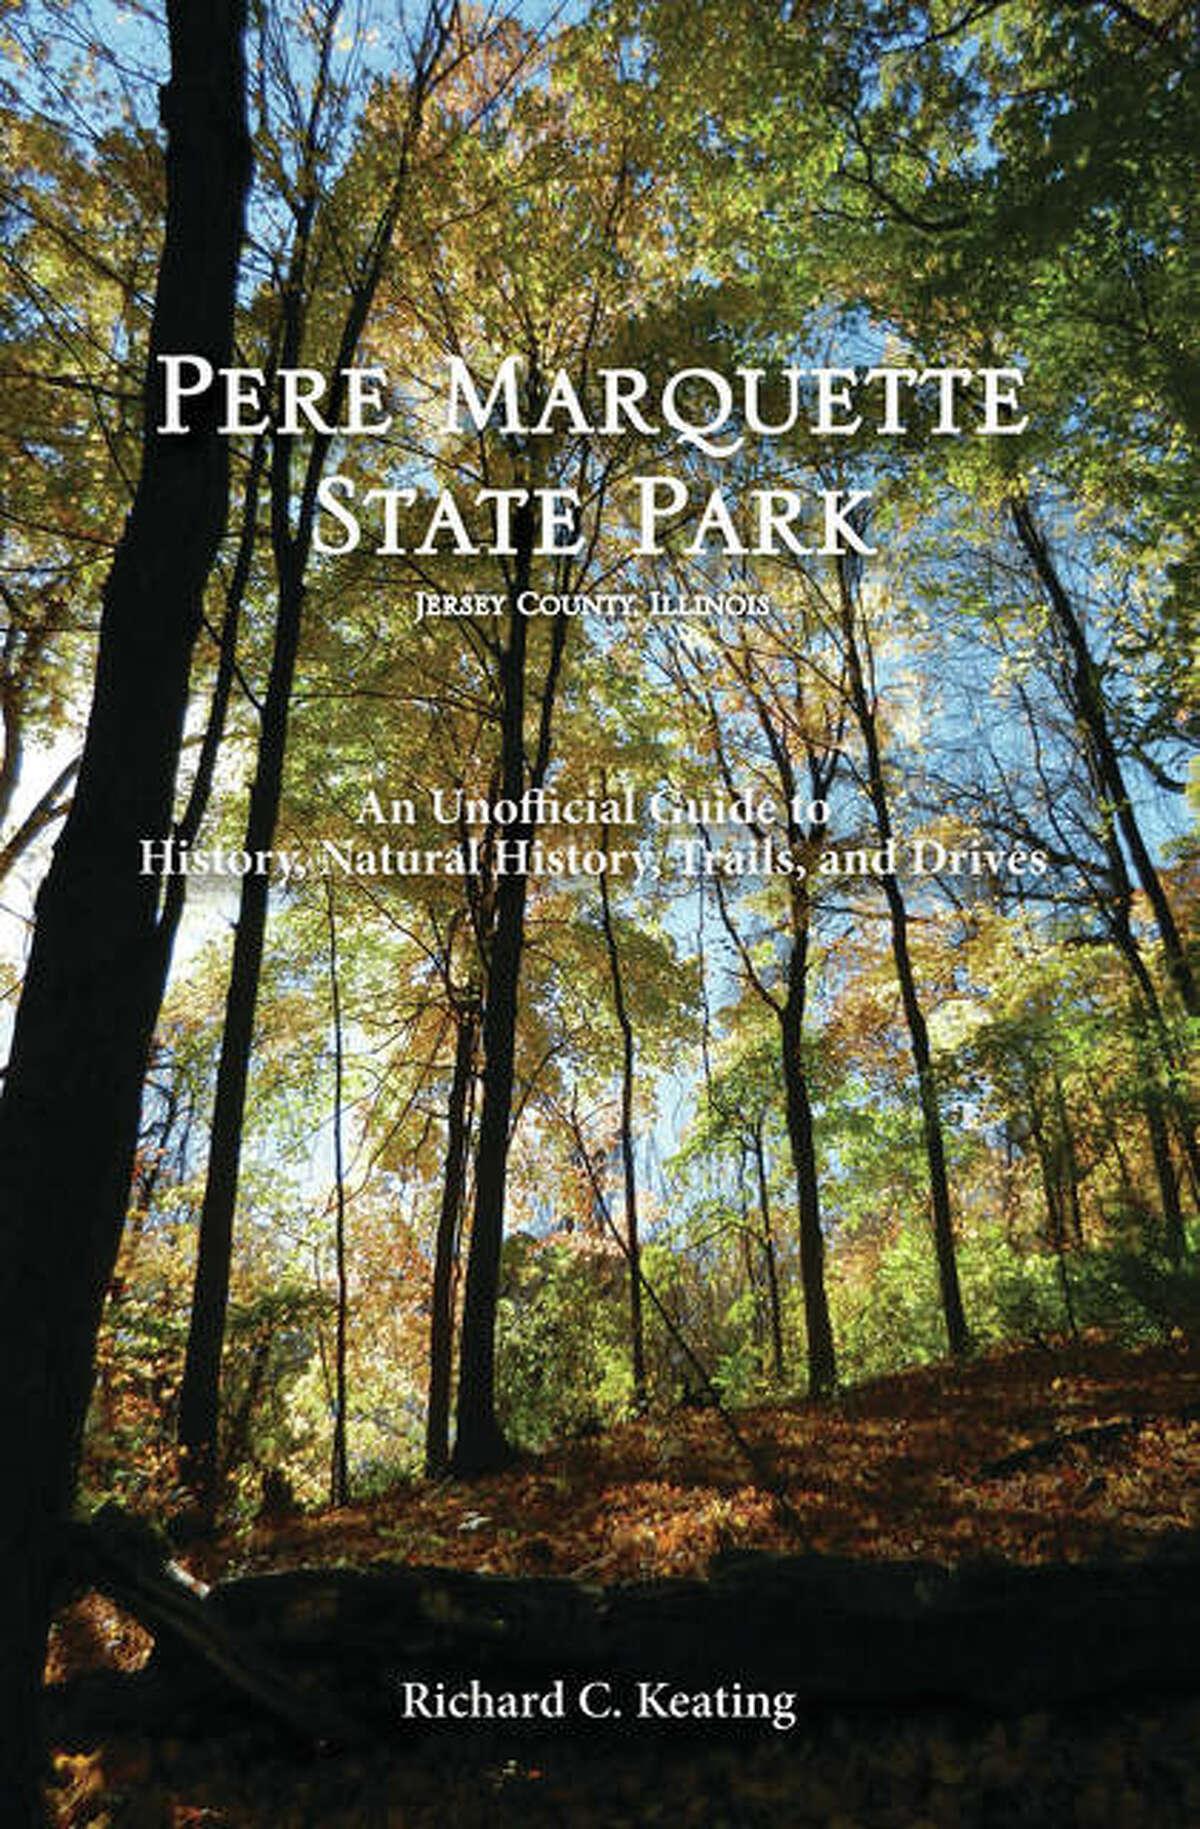 Published by Missouri Botanical Garden Press,